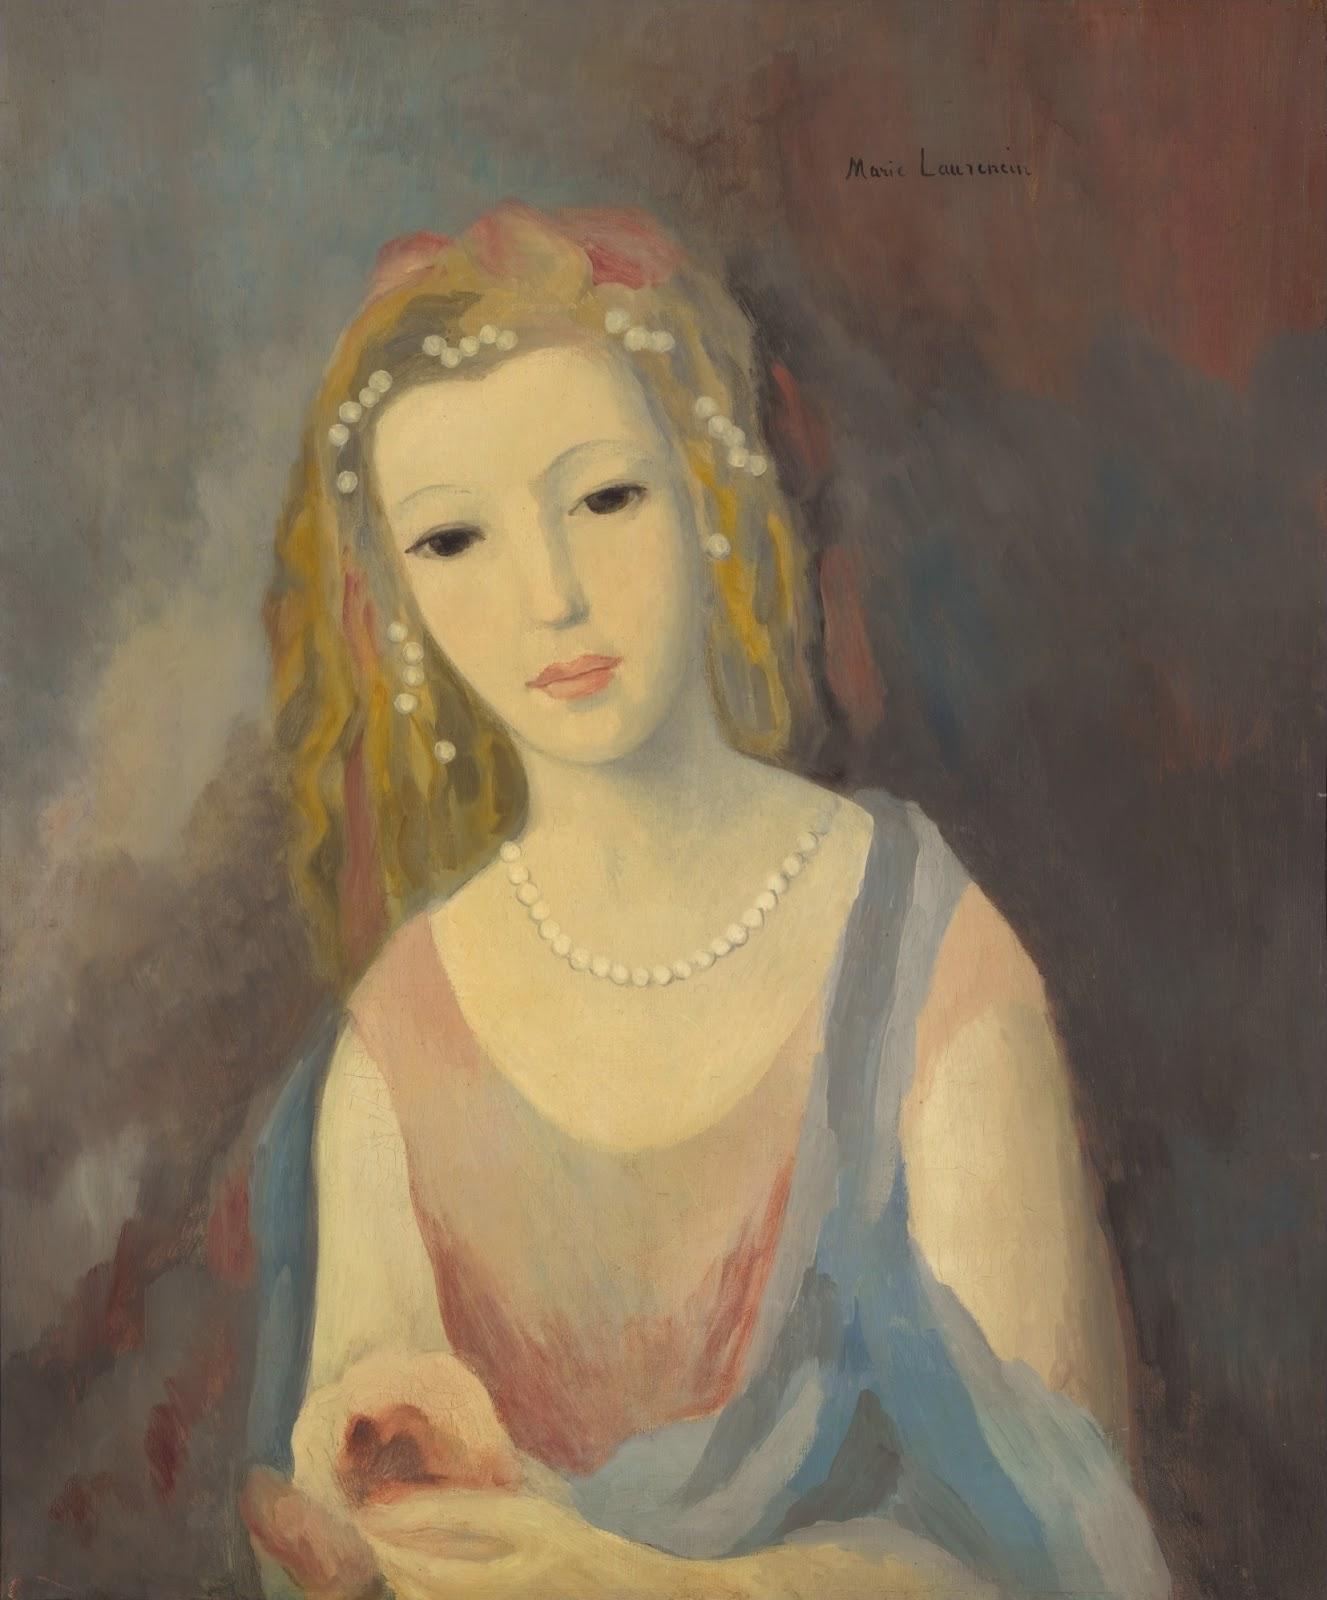 1937_Девушка с цветами в волосах (Jeune fille a la chevelure fleurie)_64.7 х 53.6_х.,м._Частное собрание.jpg